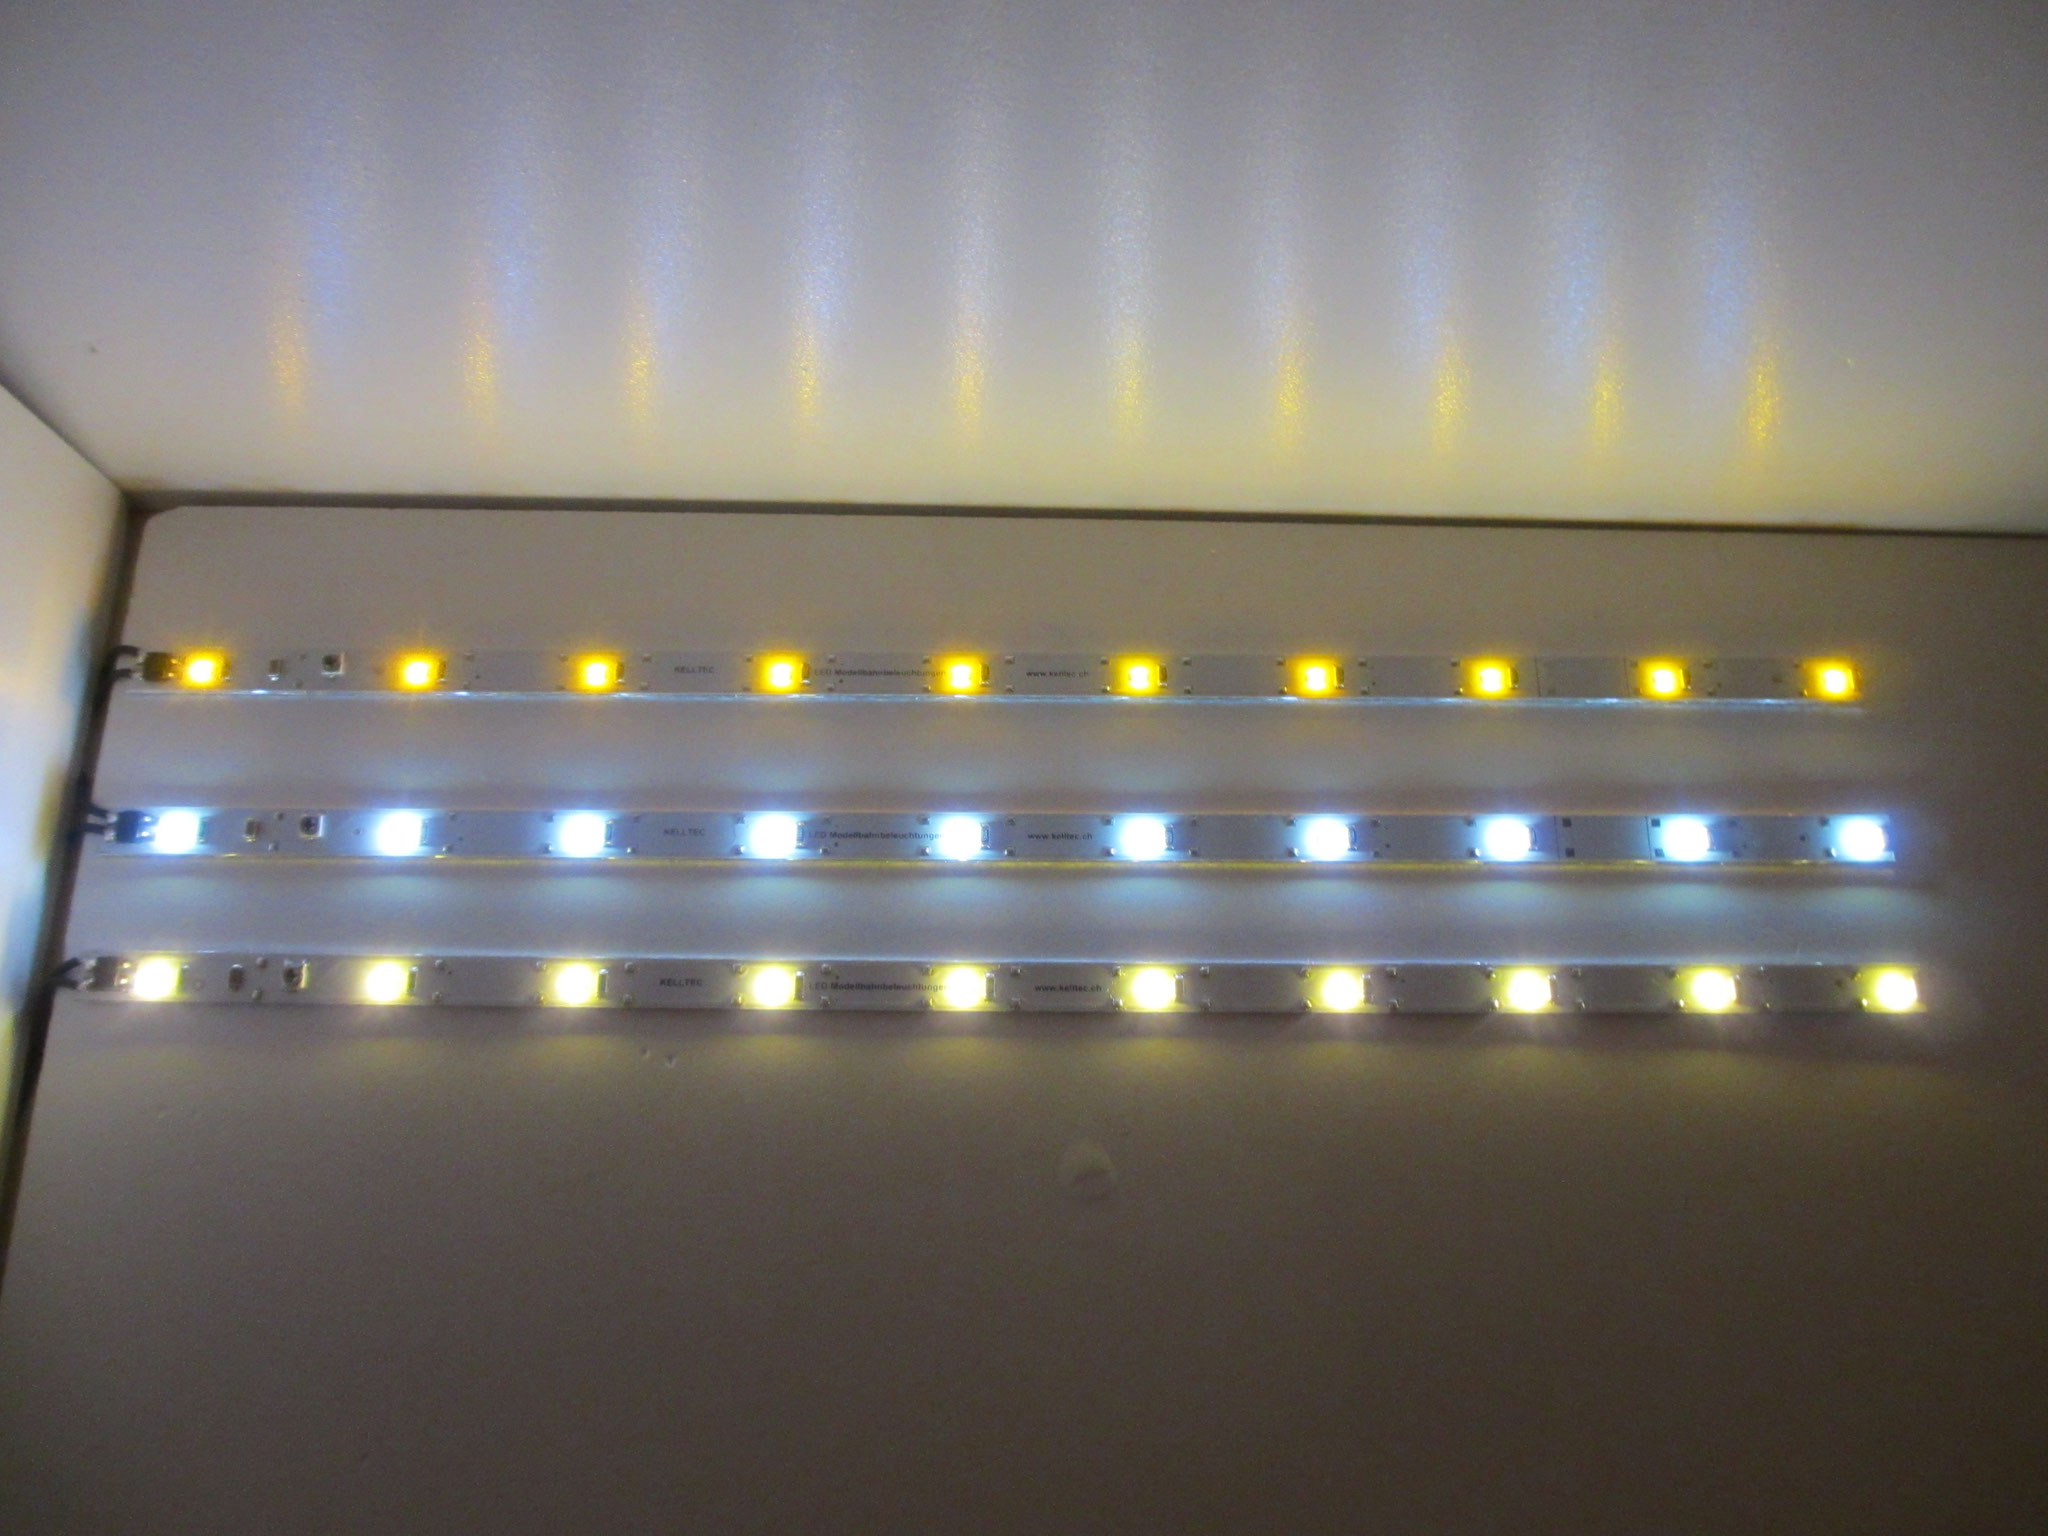 Kelltec LED Stäbe gelb, neonweiss, warmweiss